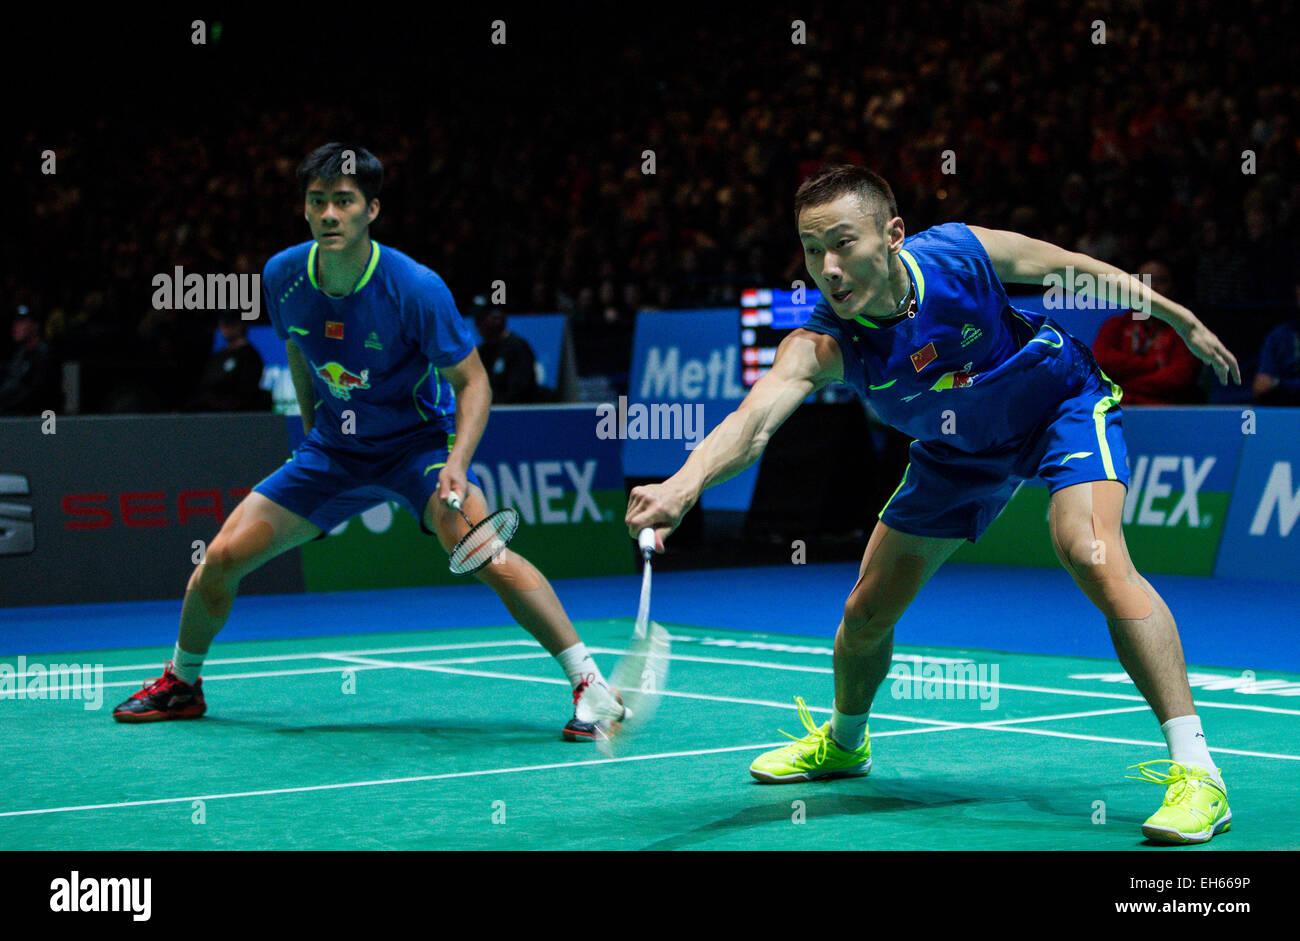 Birmingham 7th Mar 2015 Zhang Nan R and Fu Haifeng of China